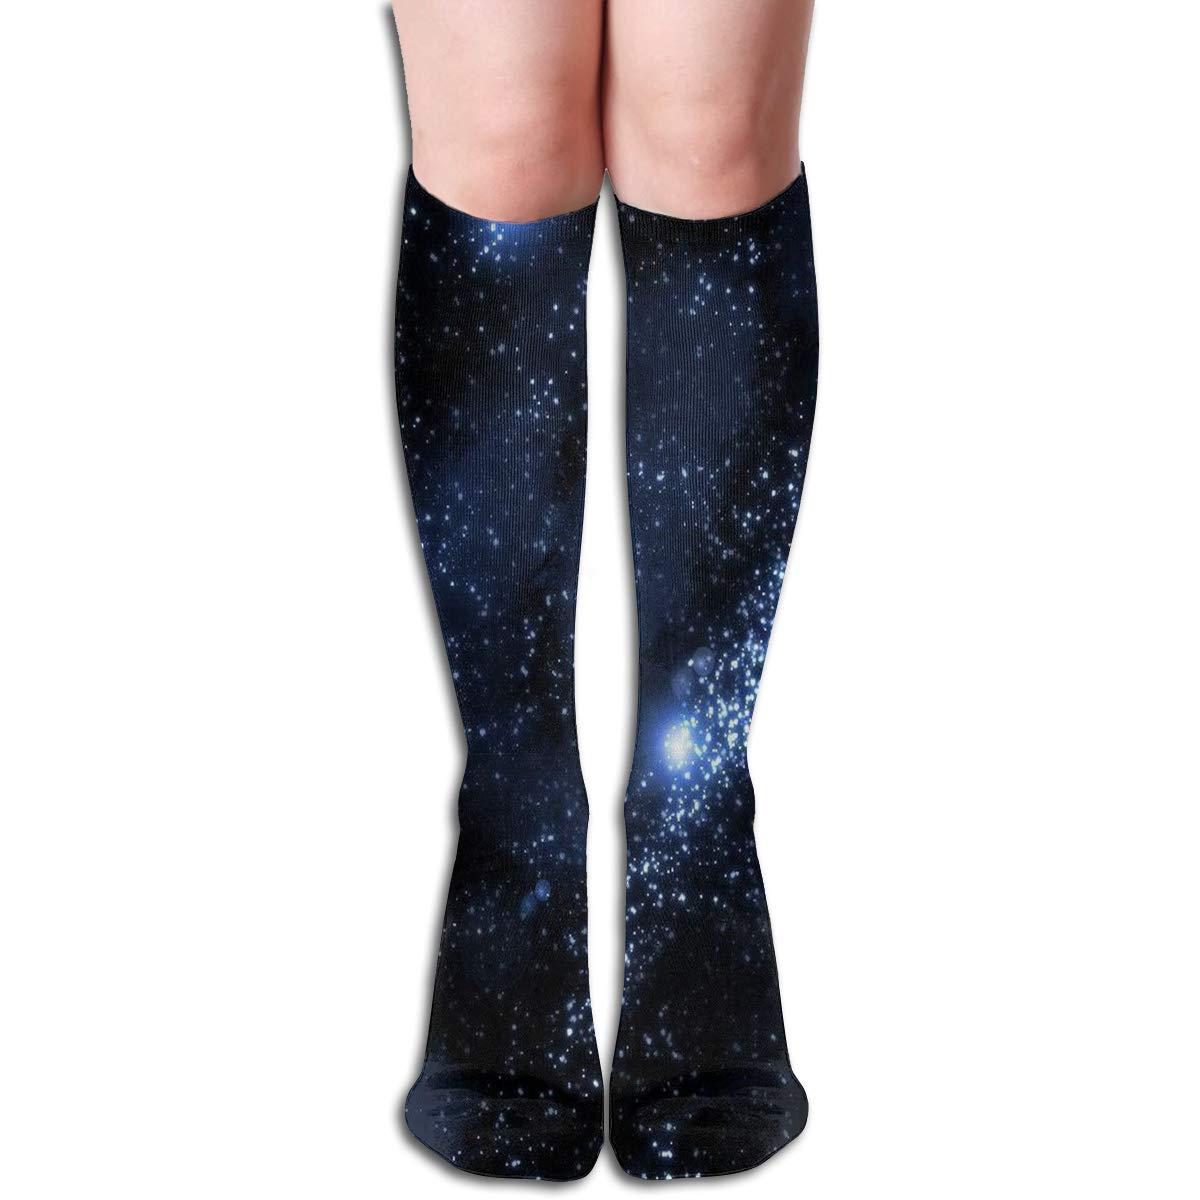 Women Socks Mid-Calf Blue Sunflower Winter Stylish For Party